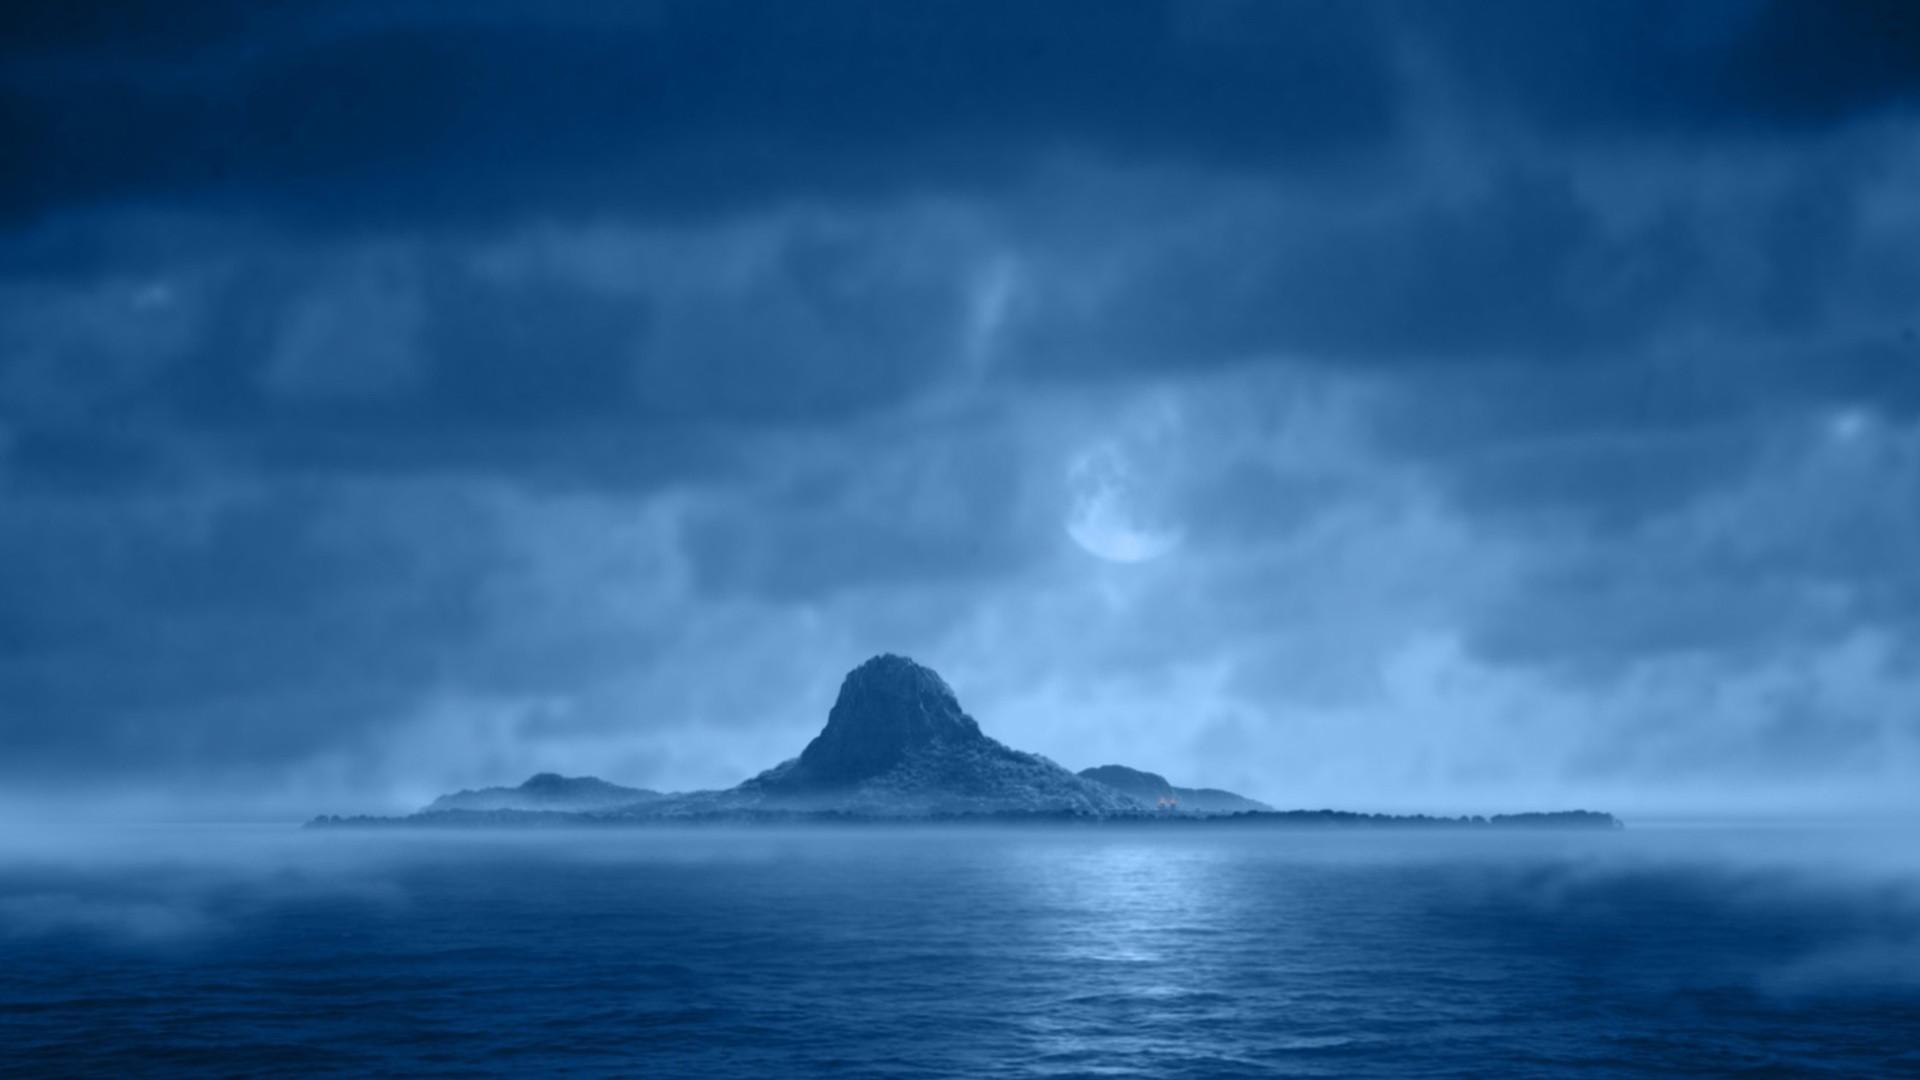 Island in the blue night HD Wallpaper 1920×1080